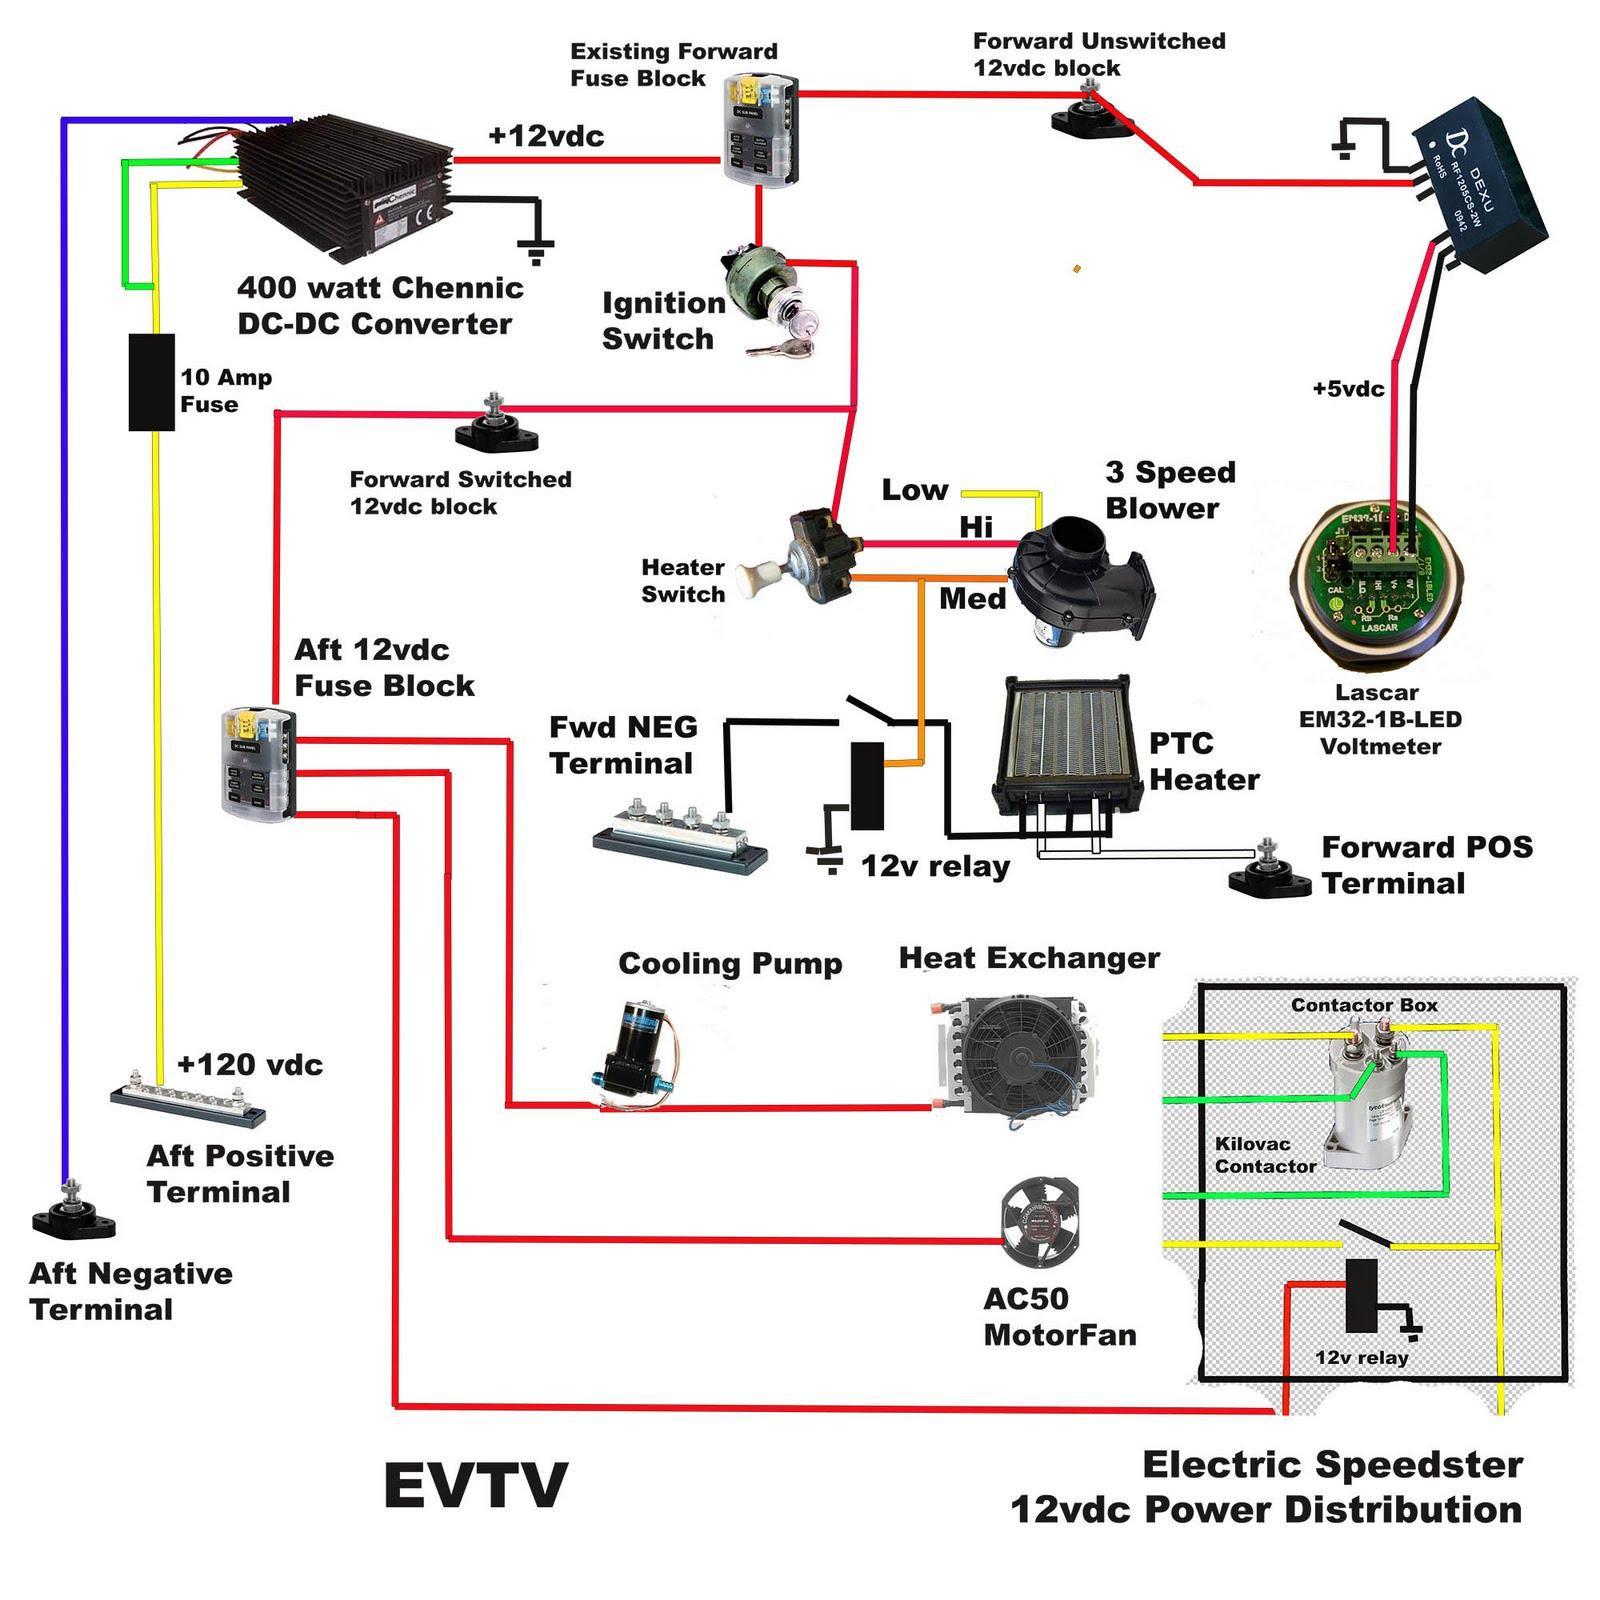 EVTVME: Speedster Pictorial Diagrams